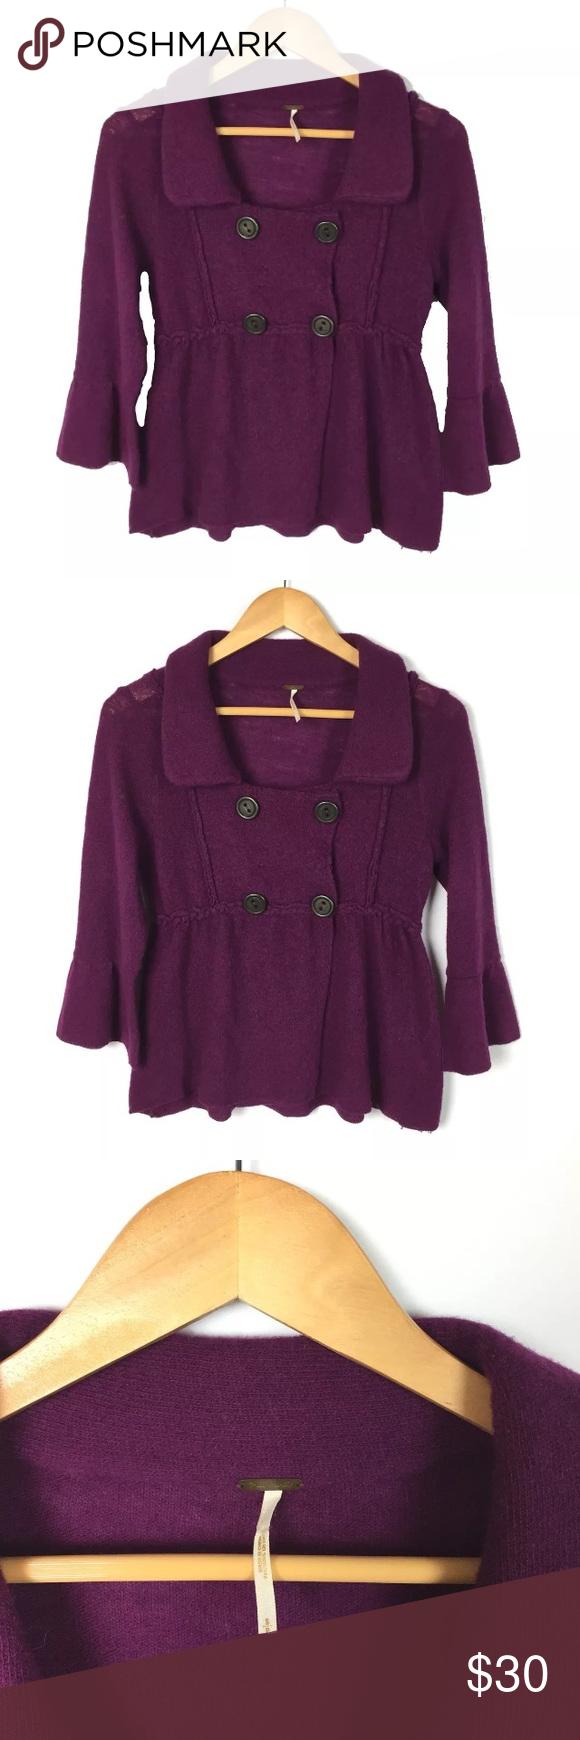 127e4995724 Free People Purple Wool Cardigan Sweater S Free People Cardigan Sweater -  Sz S Made of 100% lambswool in an eggplant purple color.